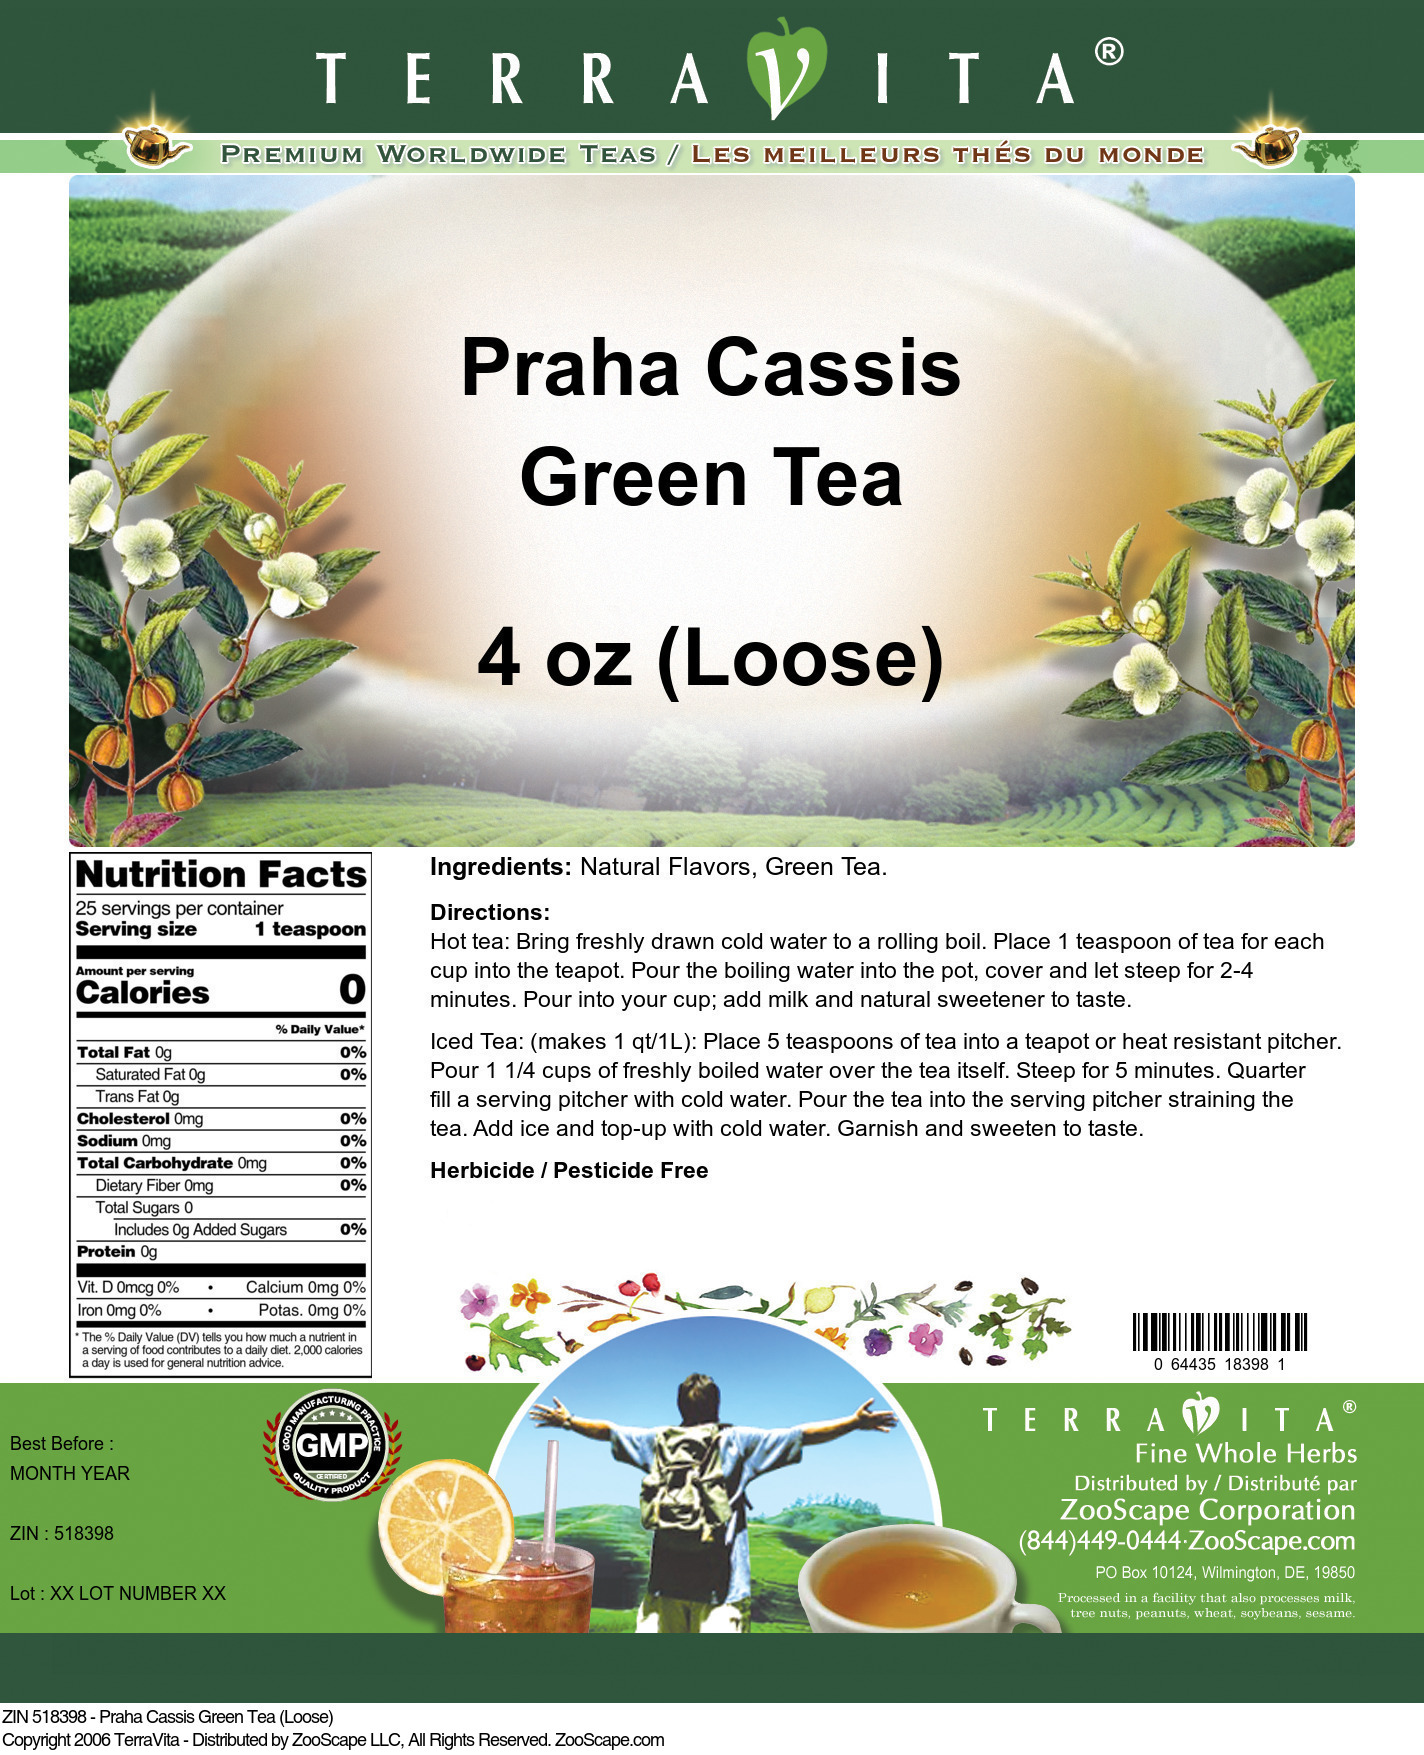 Praha Cassis Green Tea